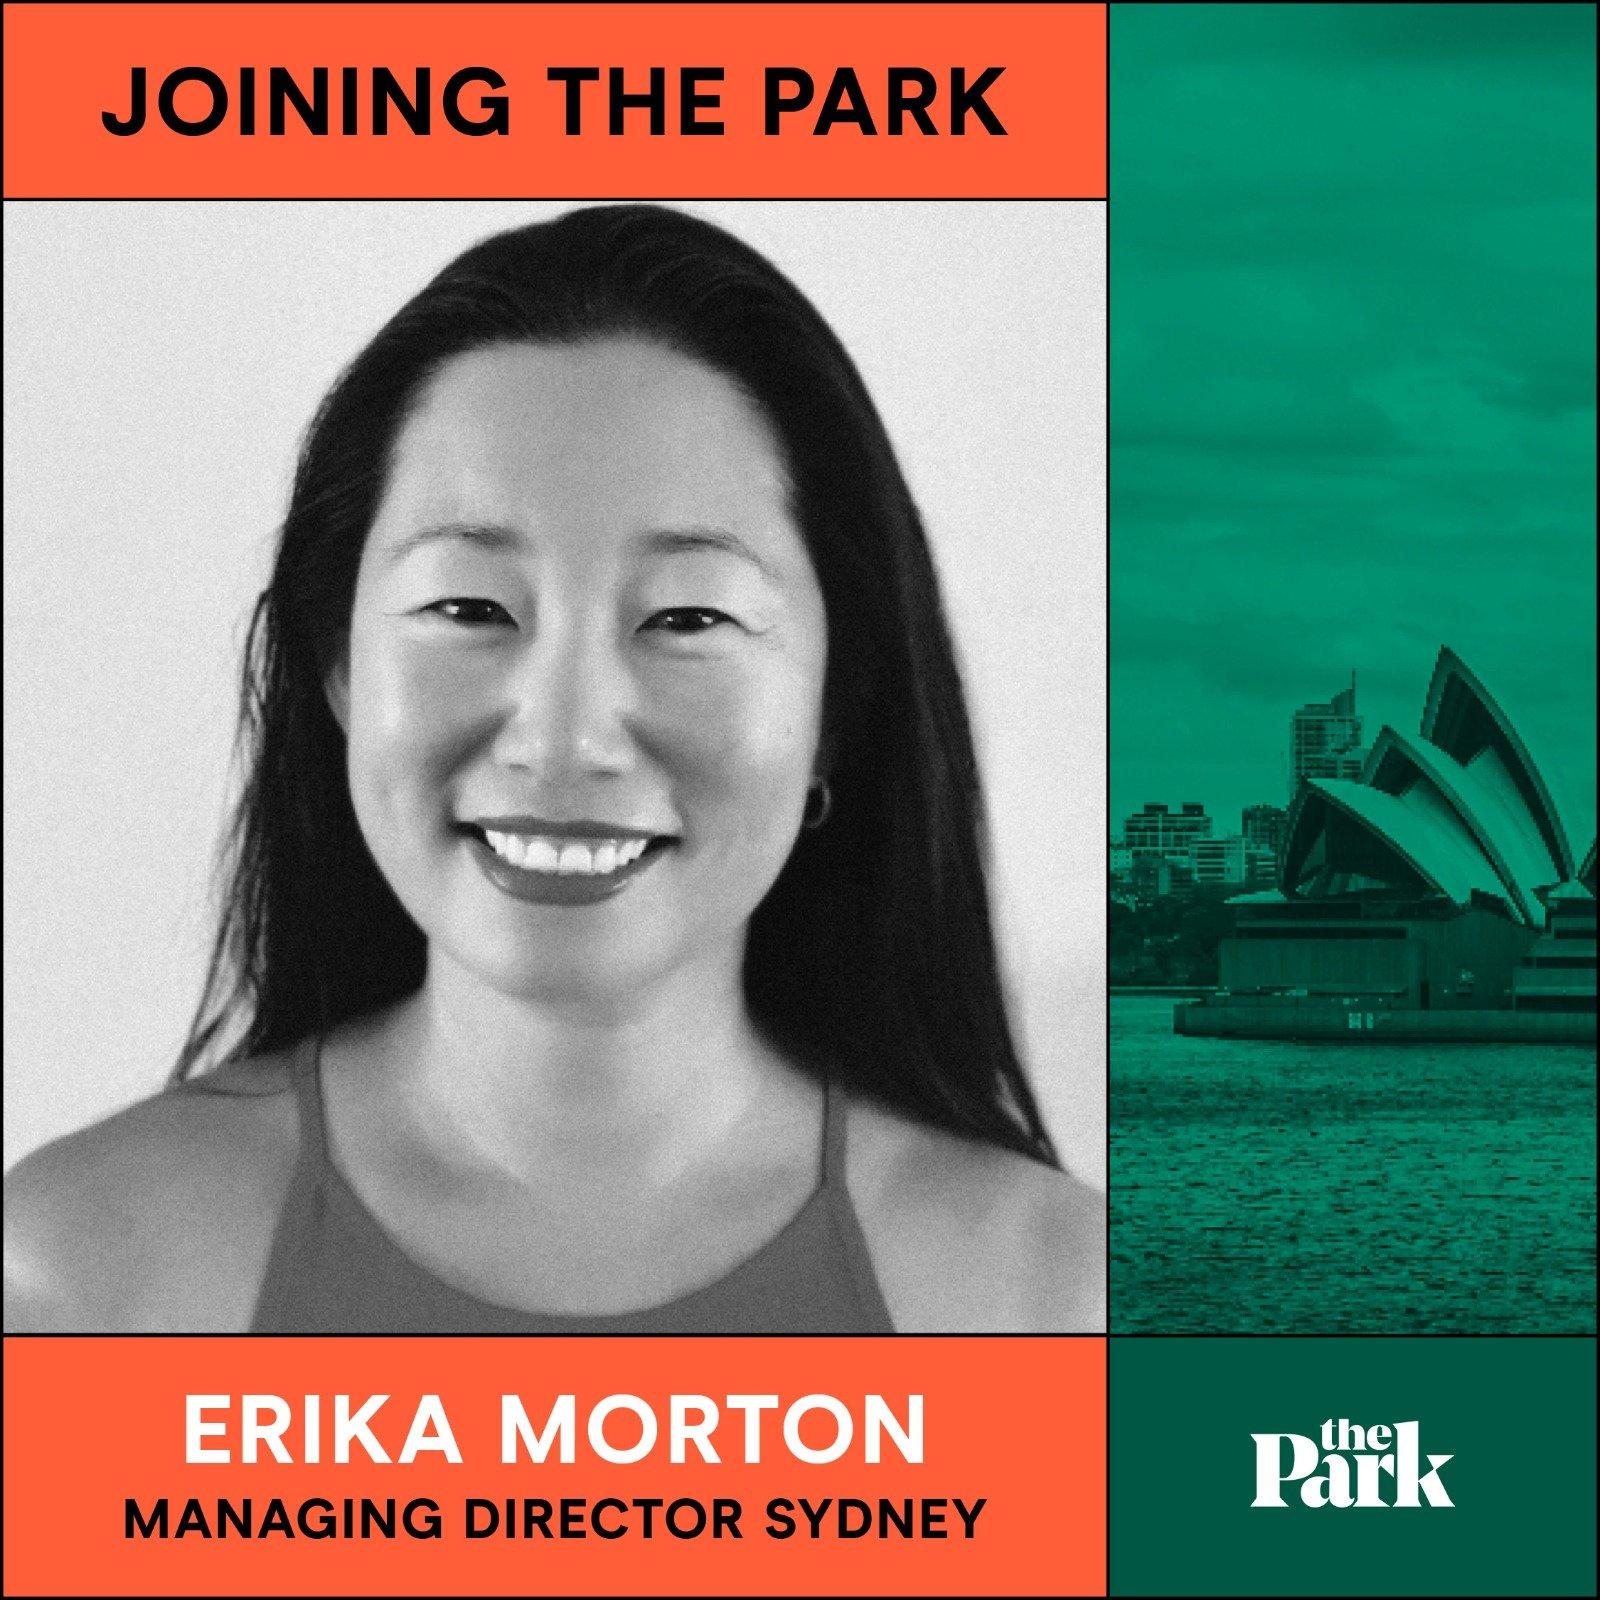 Welcome Erika